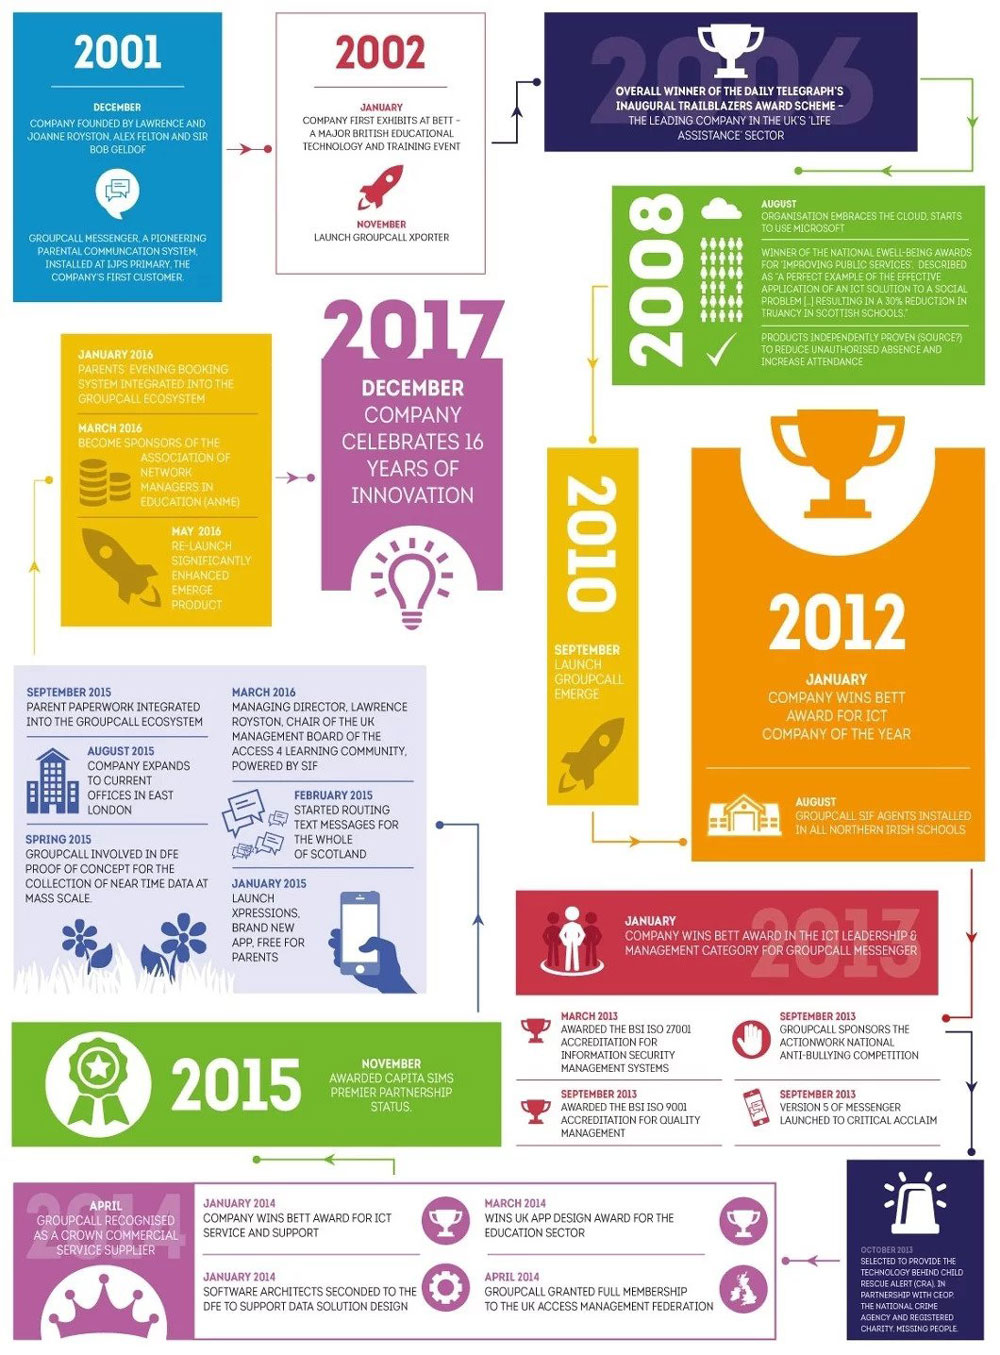 Groupcall Company Infographic